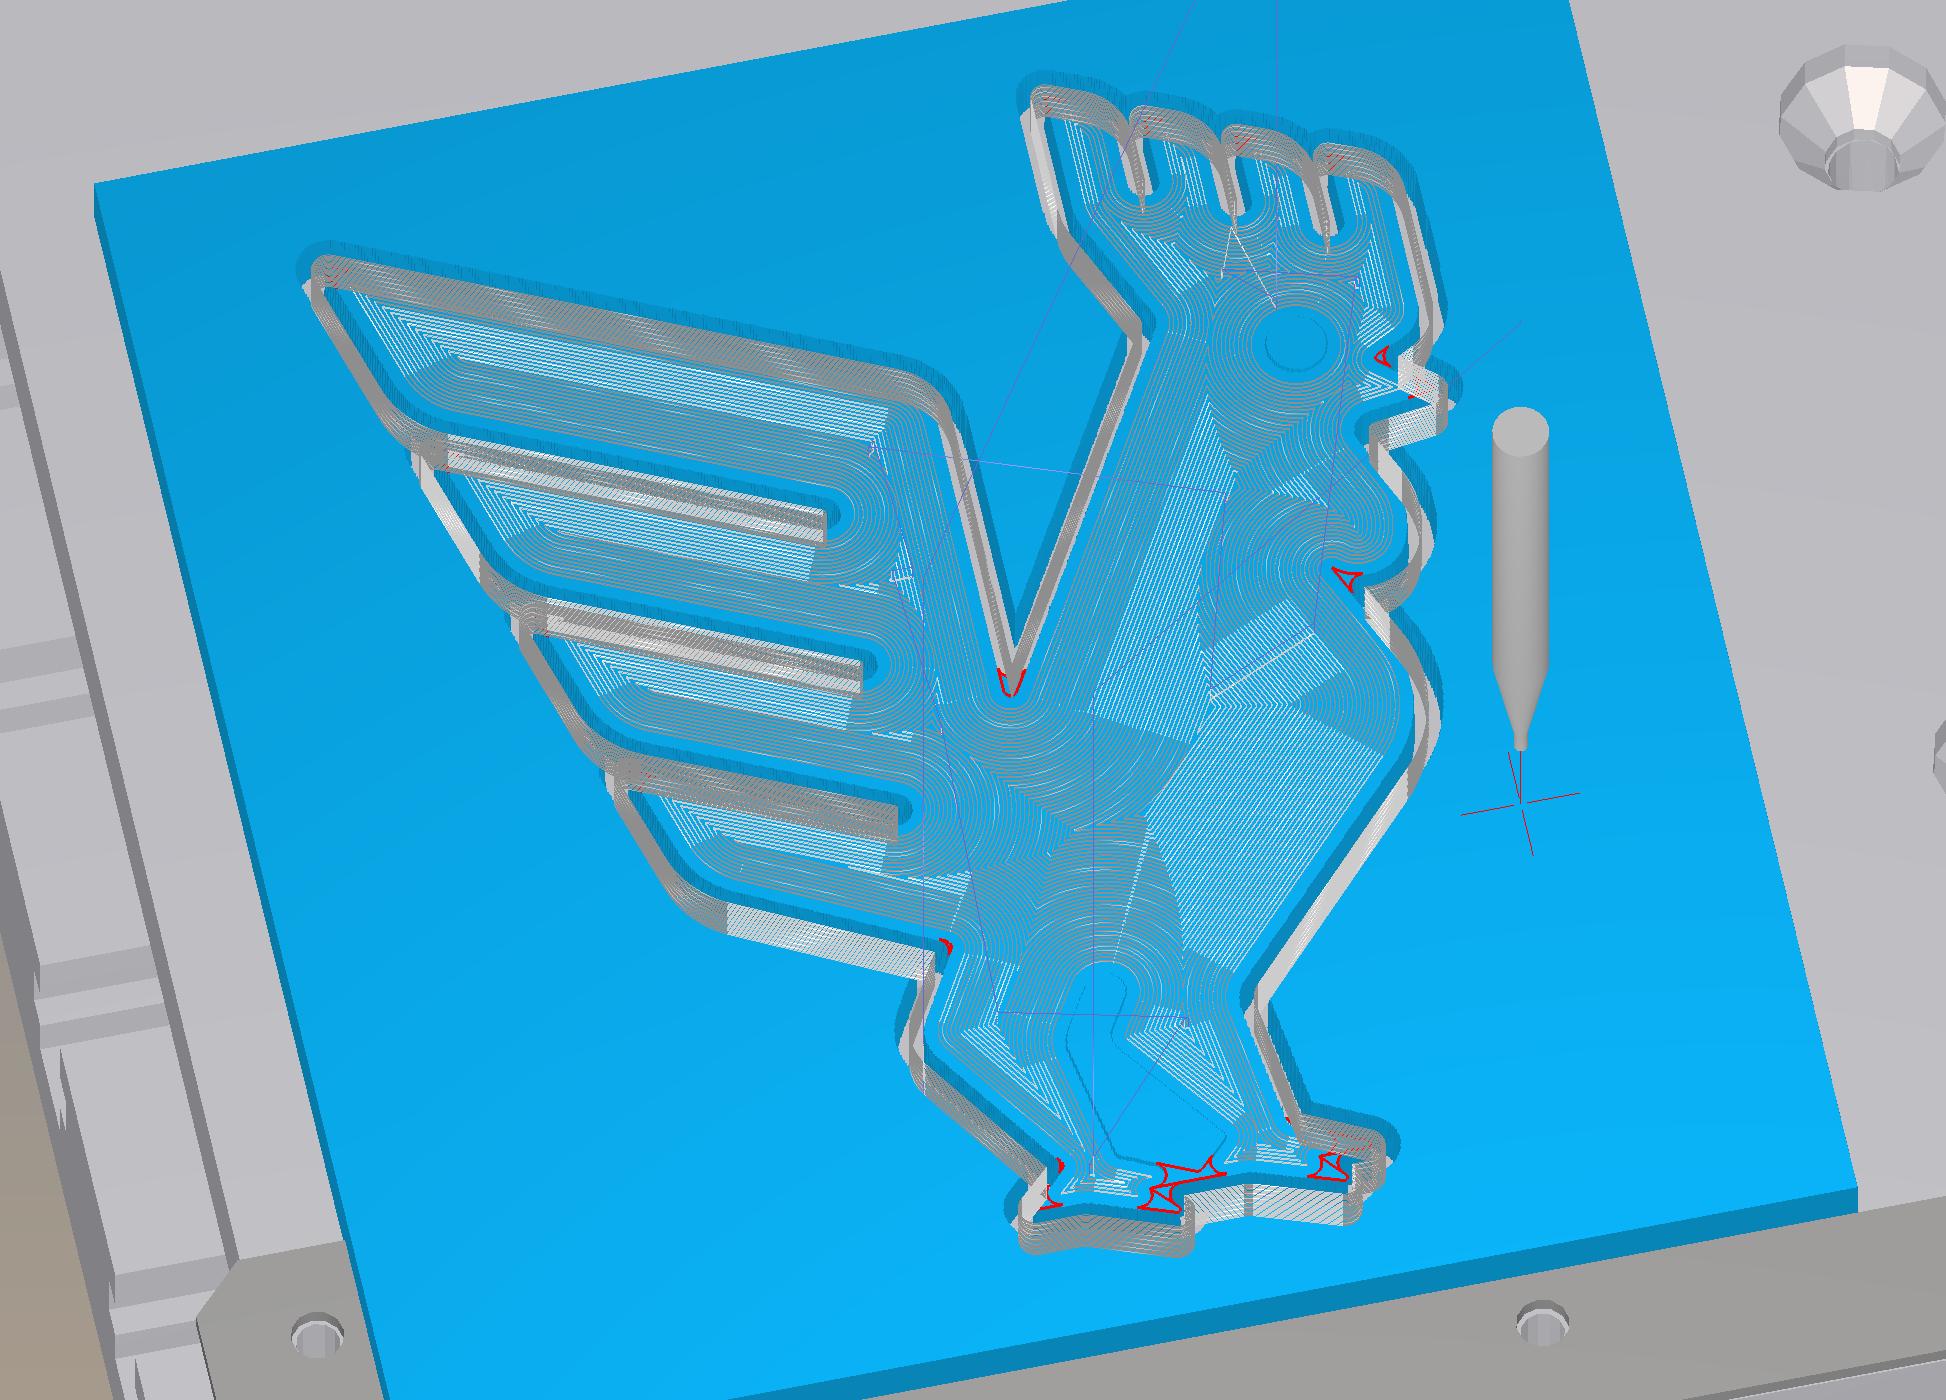 Bantam Tools rooster in the Bantam Tools Desktop Milling Machine Software.